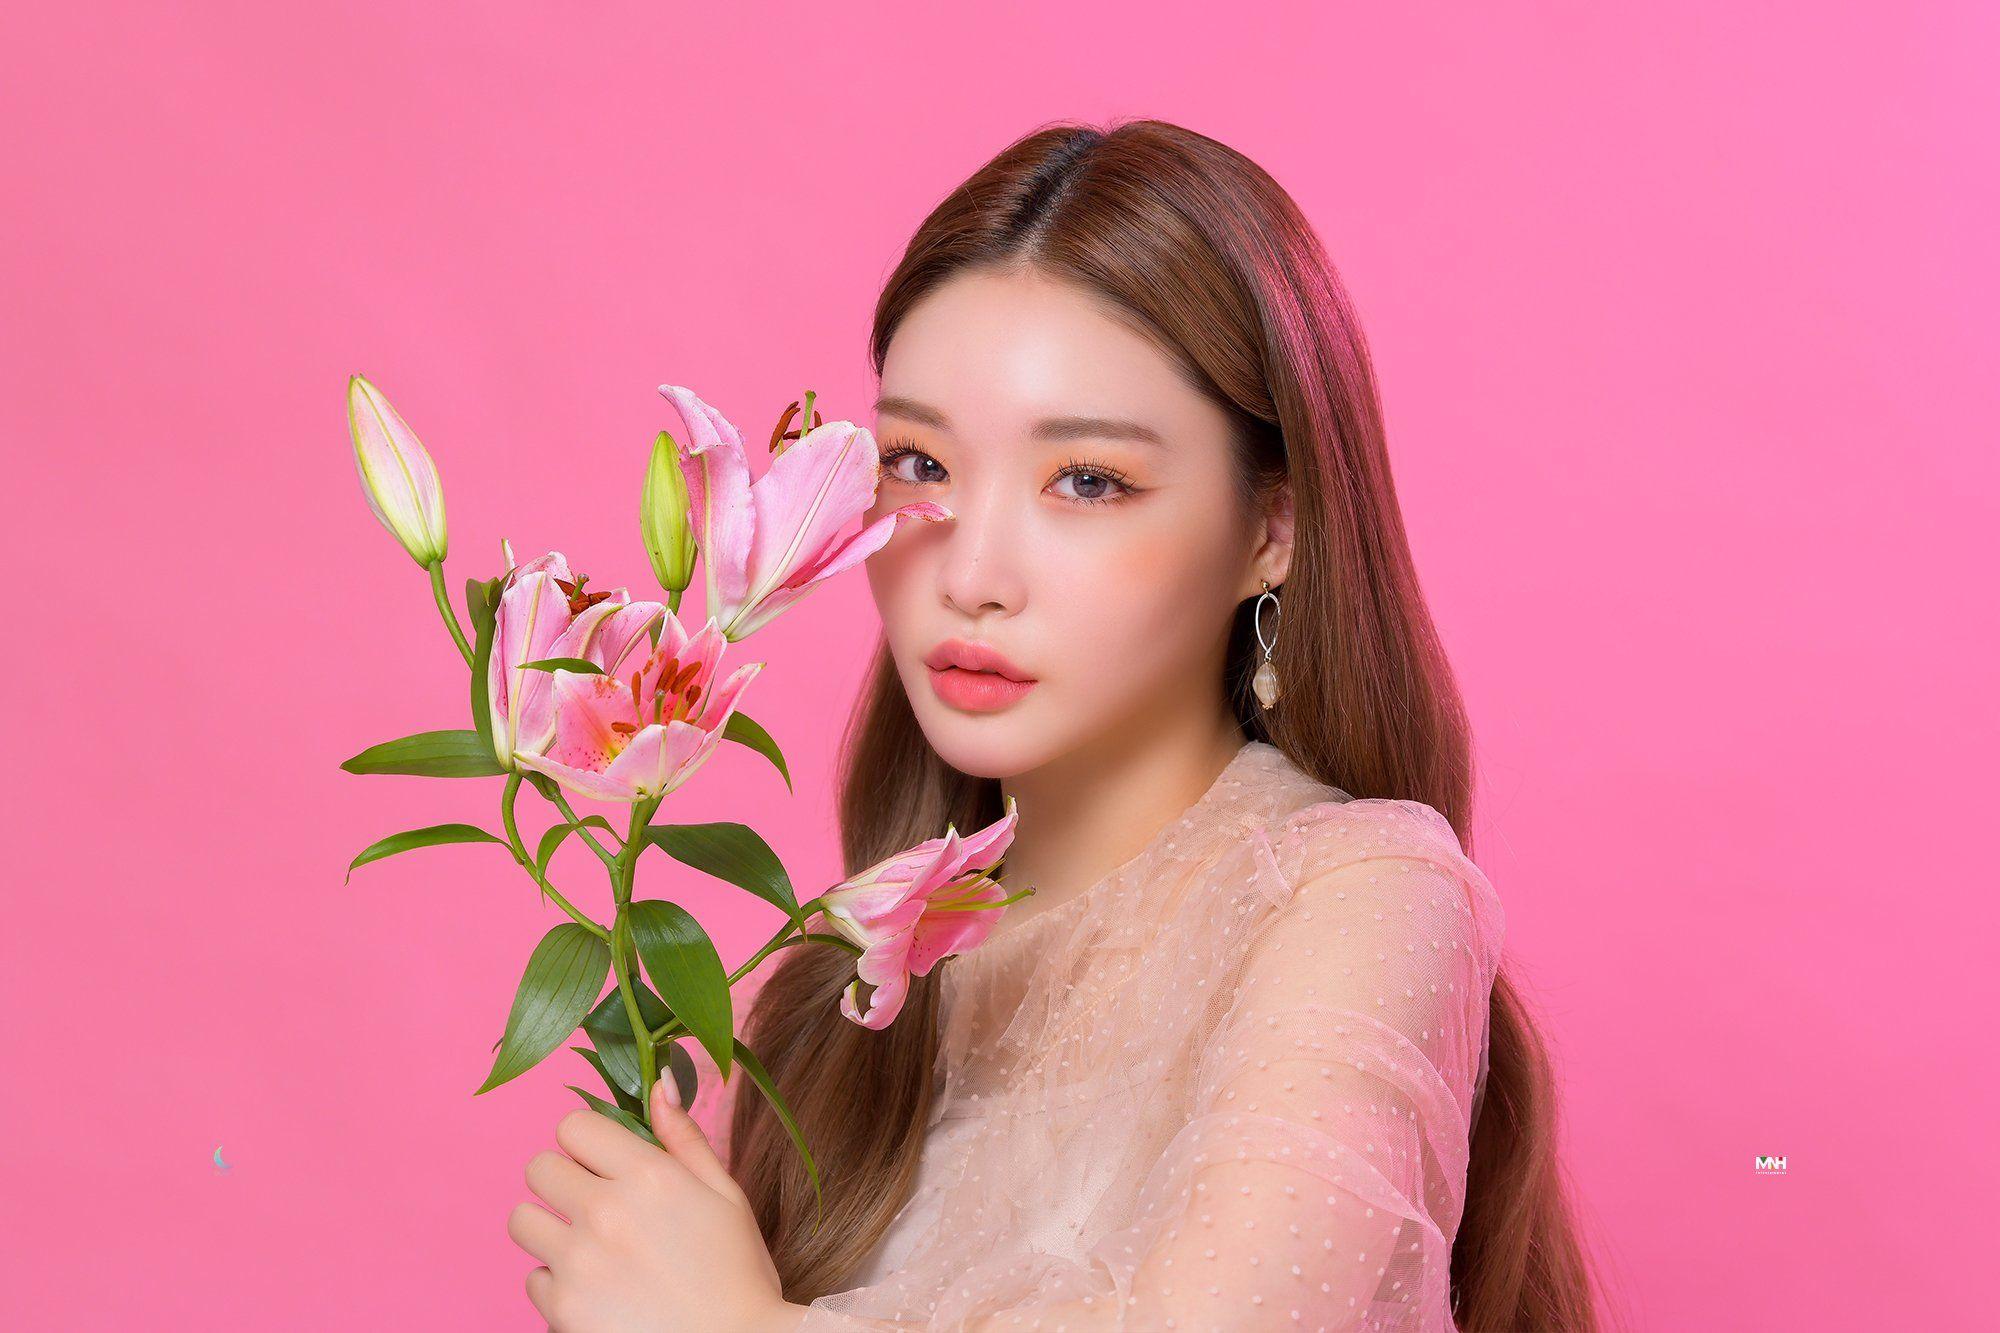 Chung Ha On Twitter Kpop Girls Photo Cards Kpop Girl Groups